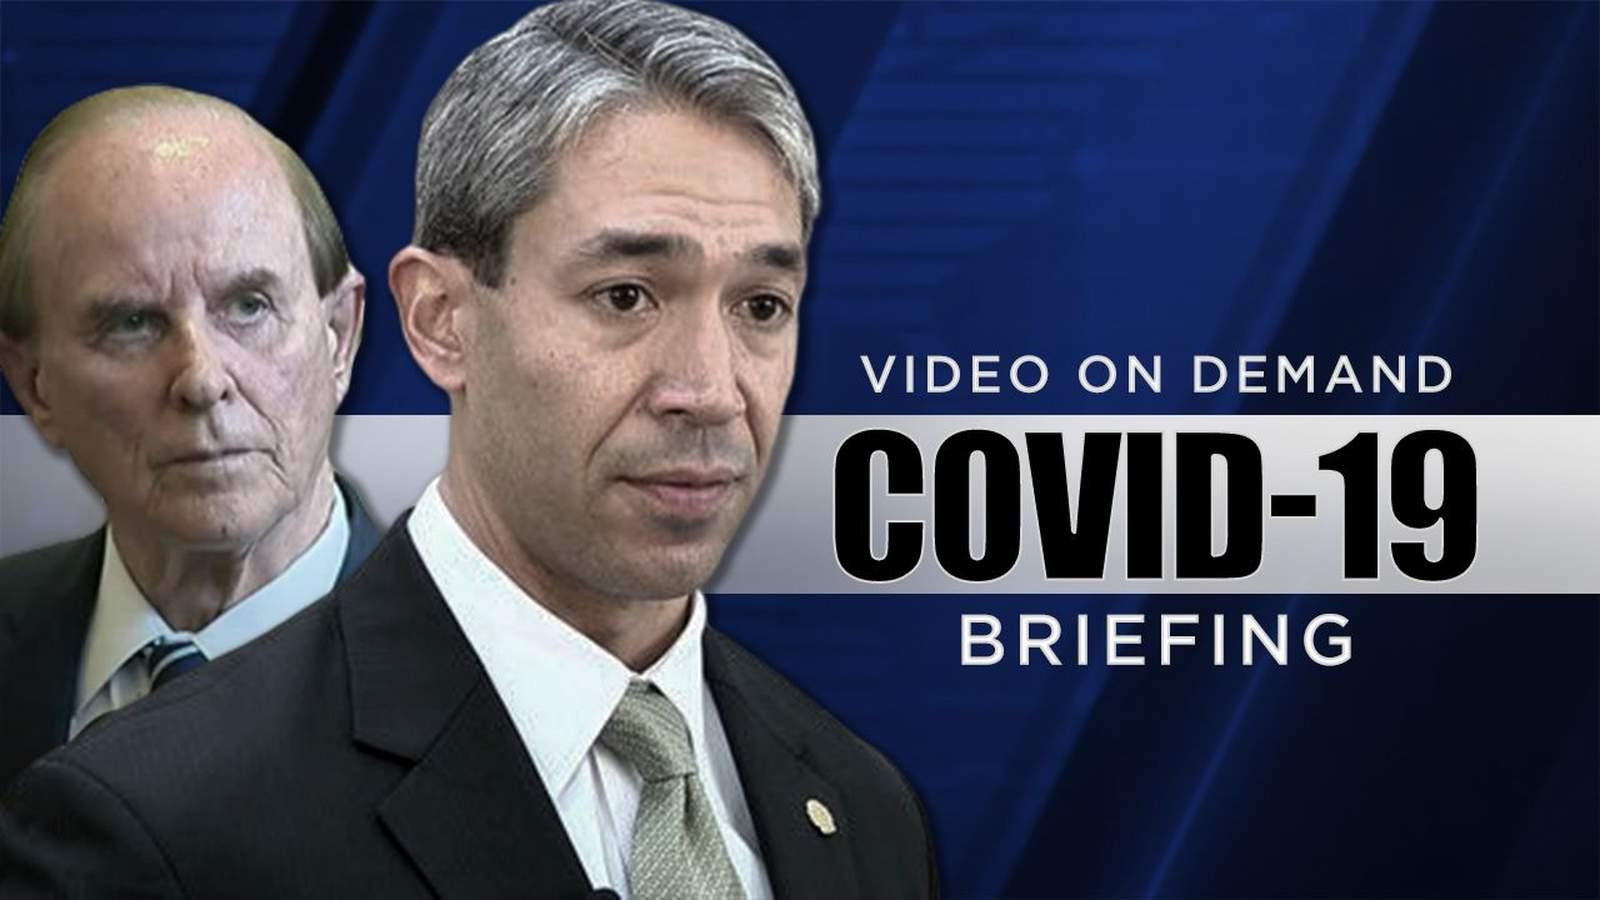 Coronavirus update San Antonio, March 4: Leaders report 242 new COVID-19 cases, 2 deaths - KSAT San Antonio